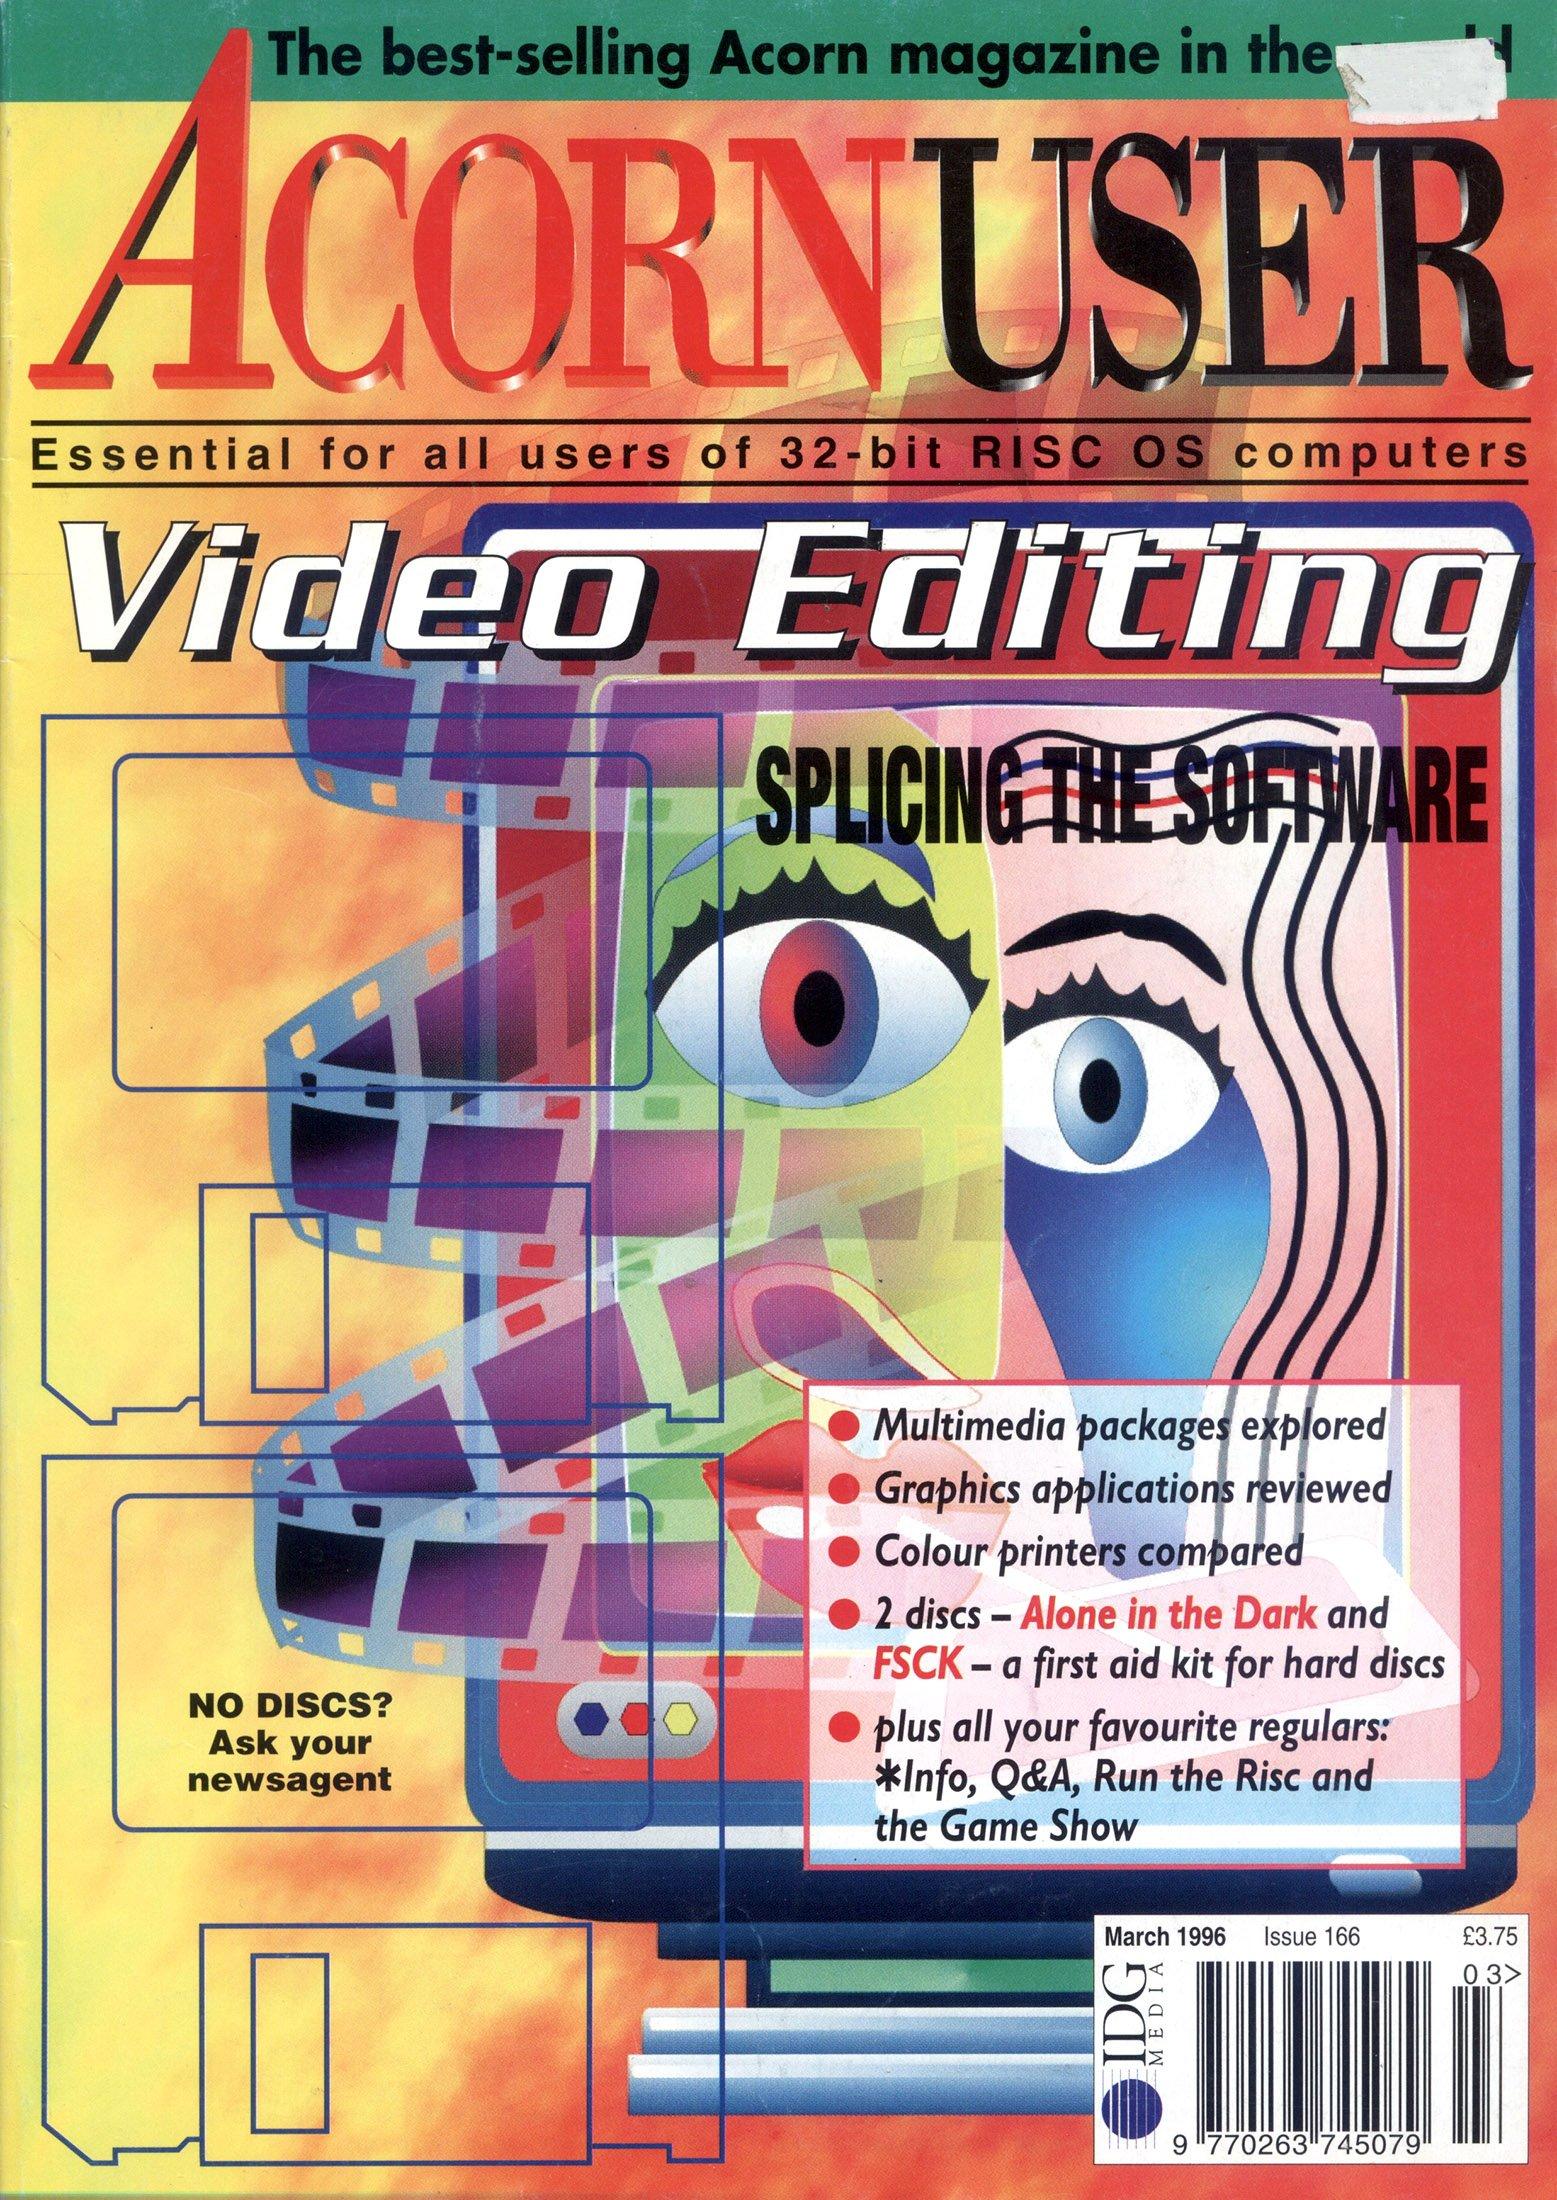 Acorn User 166 (March 1996)